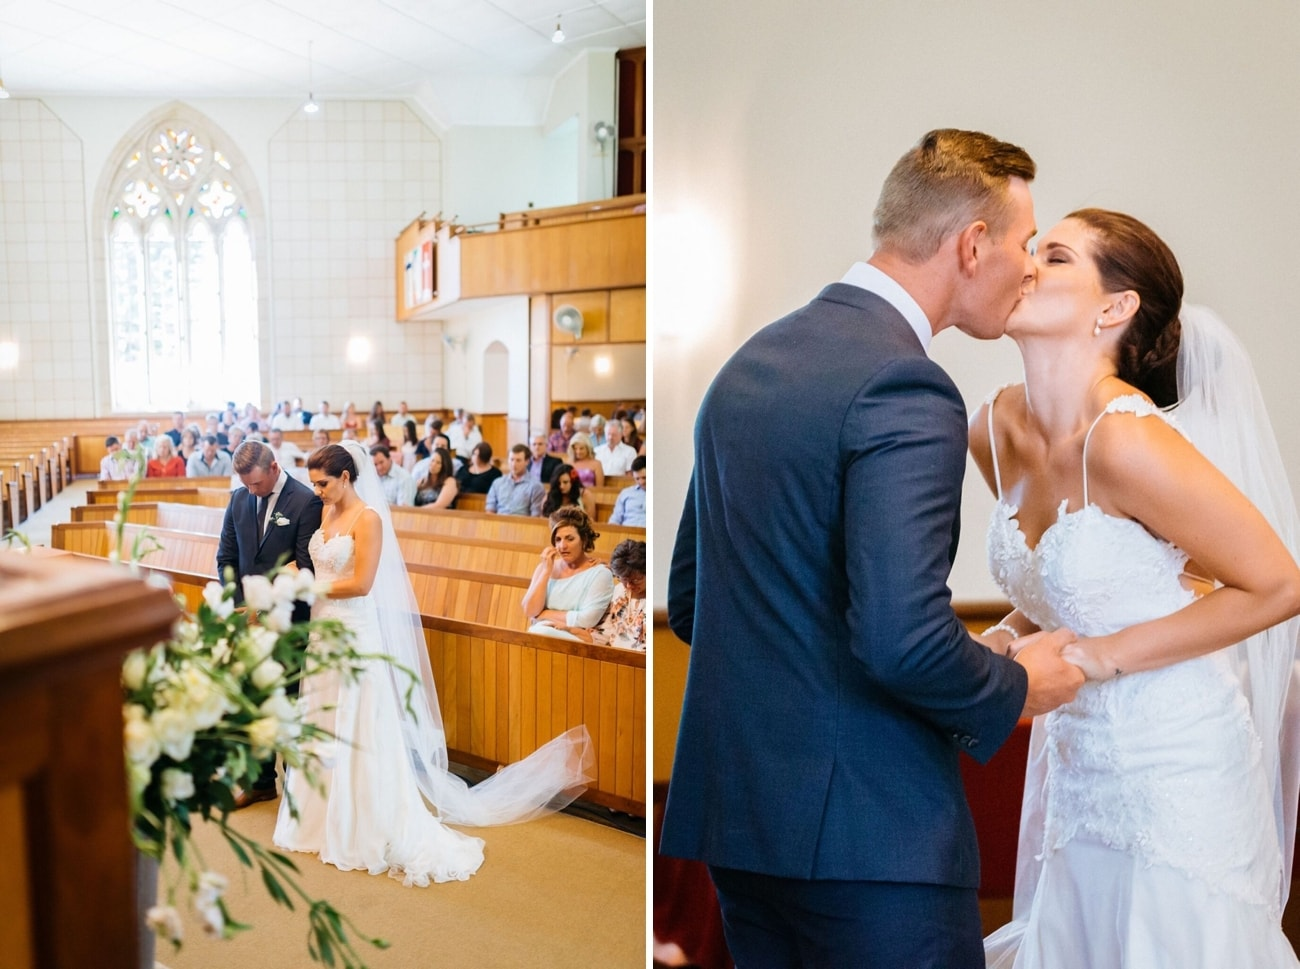 NG Kerk wedding ceremony | Credit: Matthew Carr